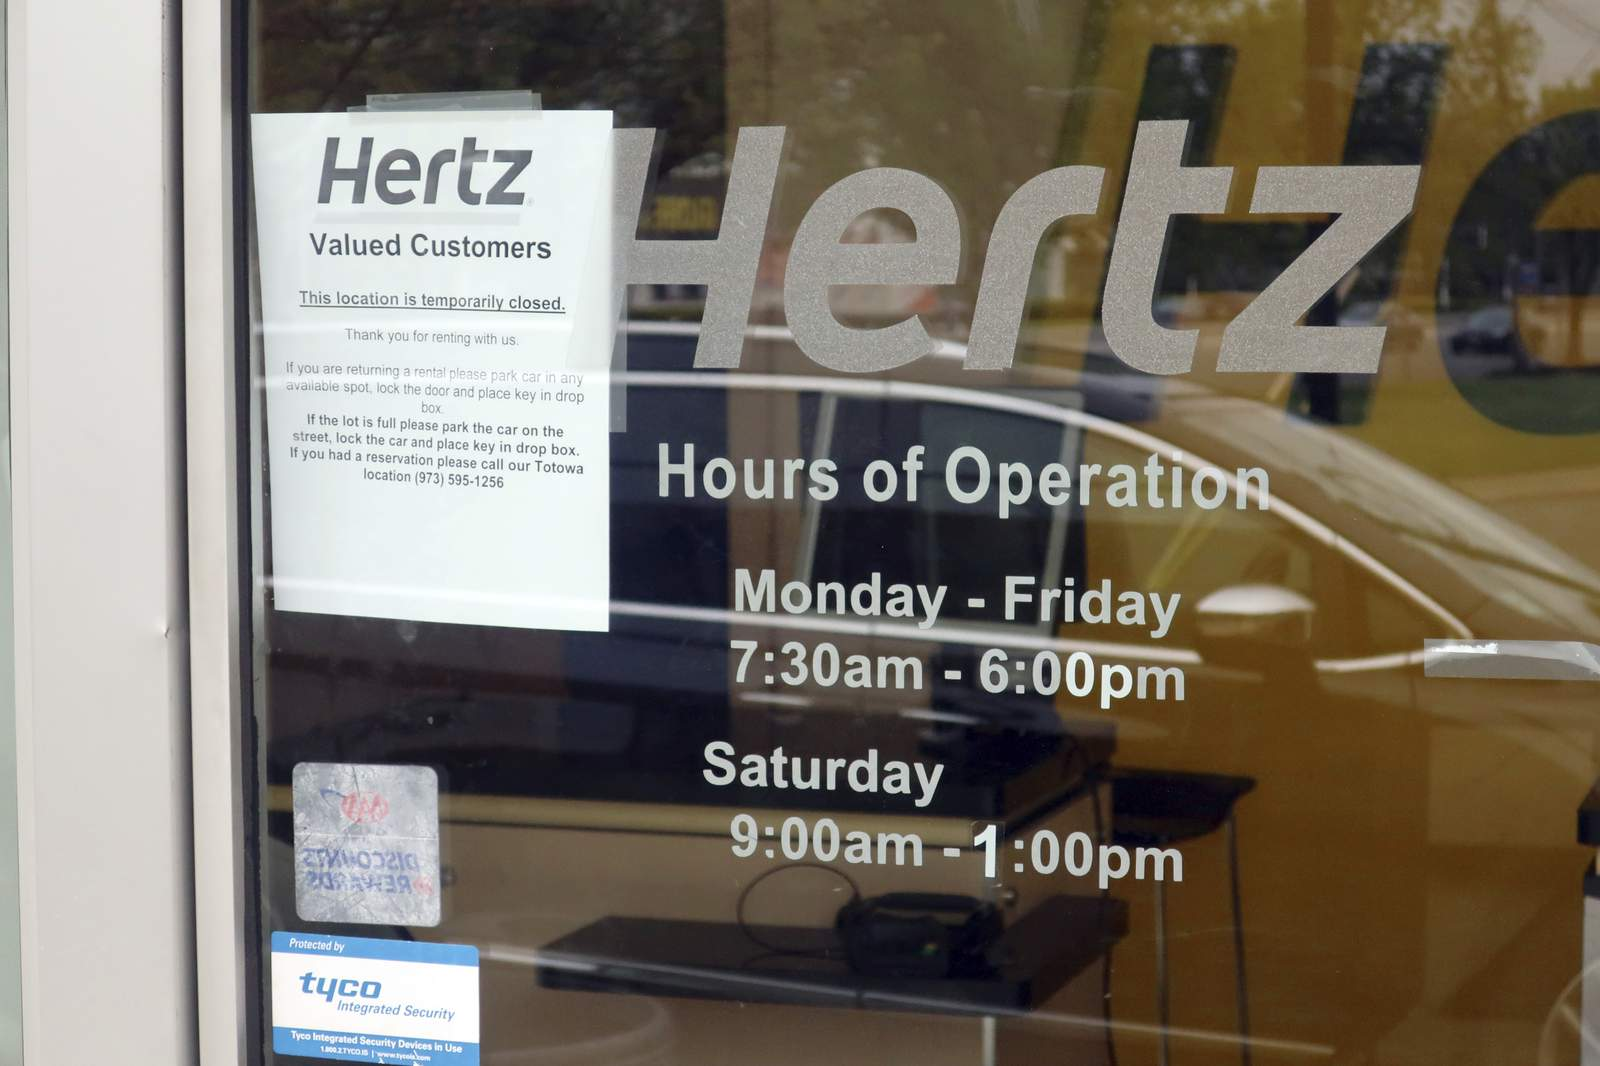 Debt and coronavirus push Hertz into bankruptcy protection - WKMG News 6 & ClickOrlando